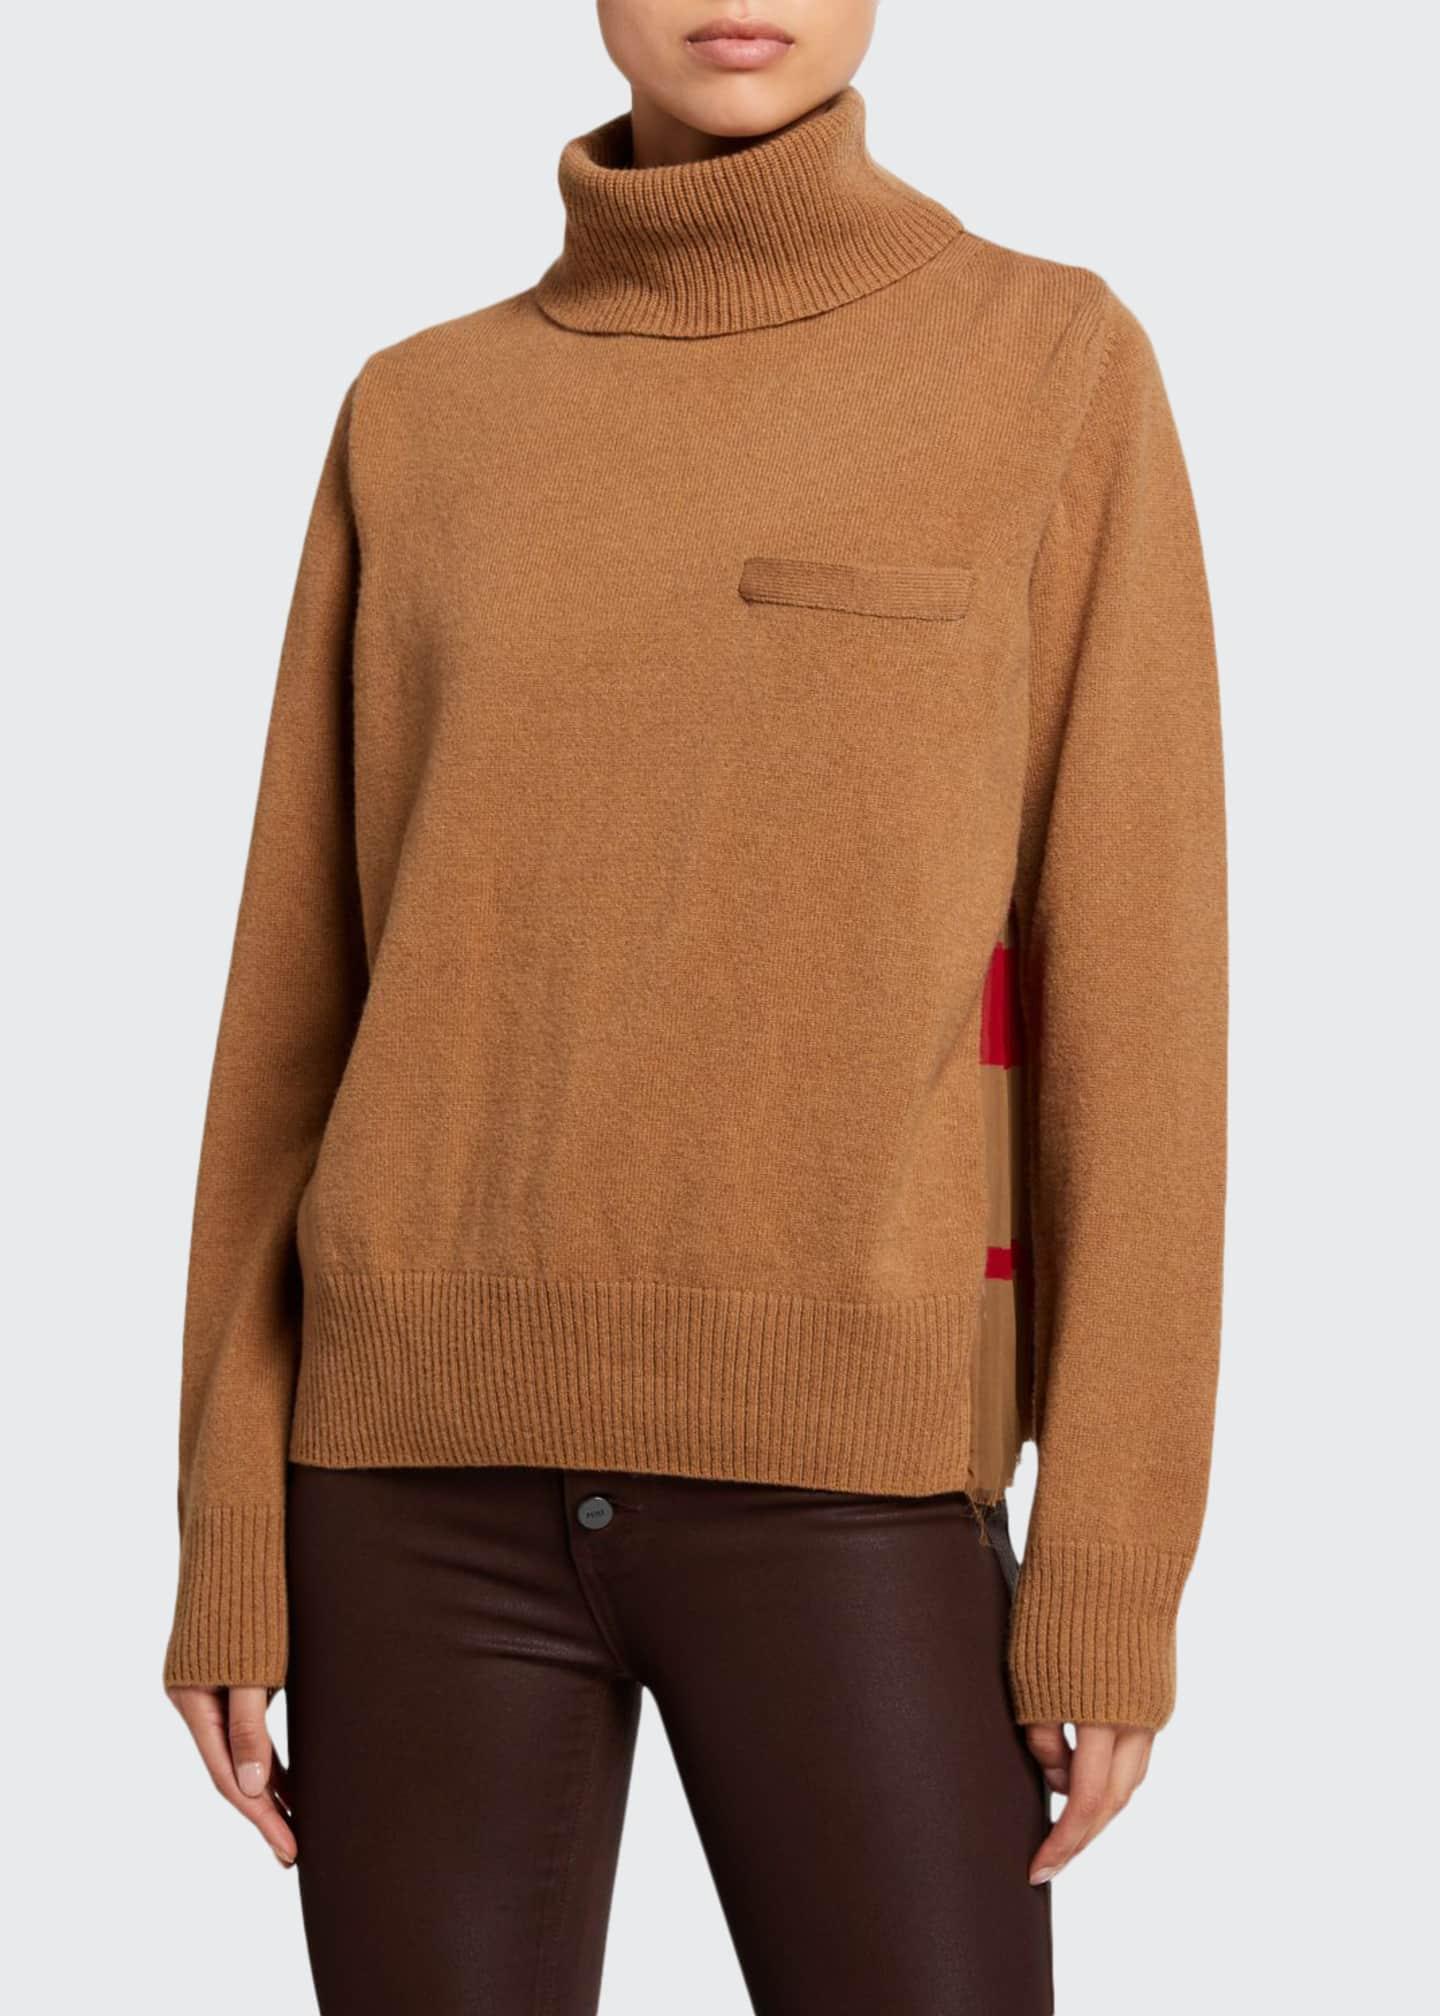 SACAI Solid Front Blanket Print Turtleneck Sweater